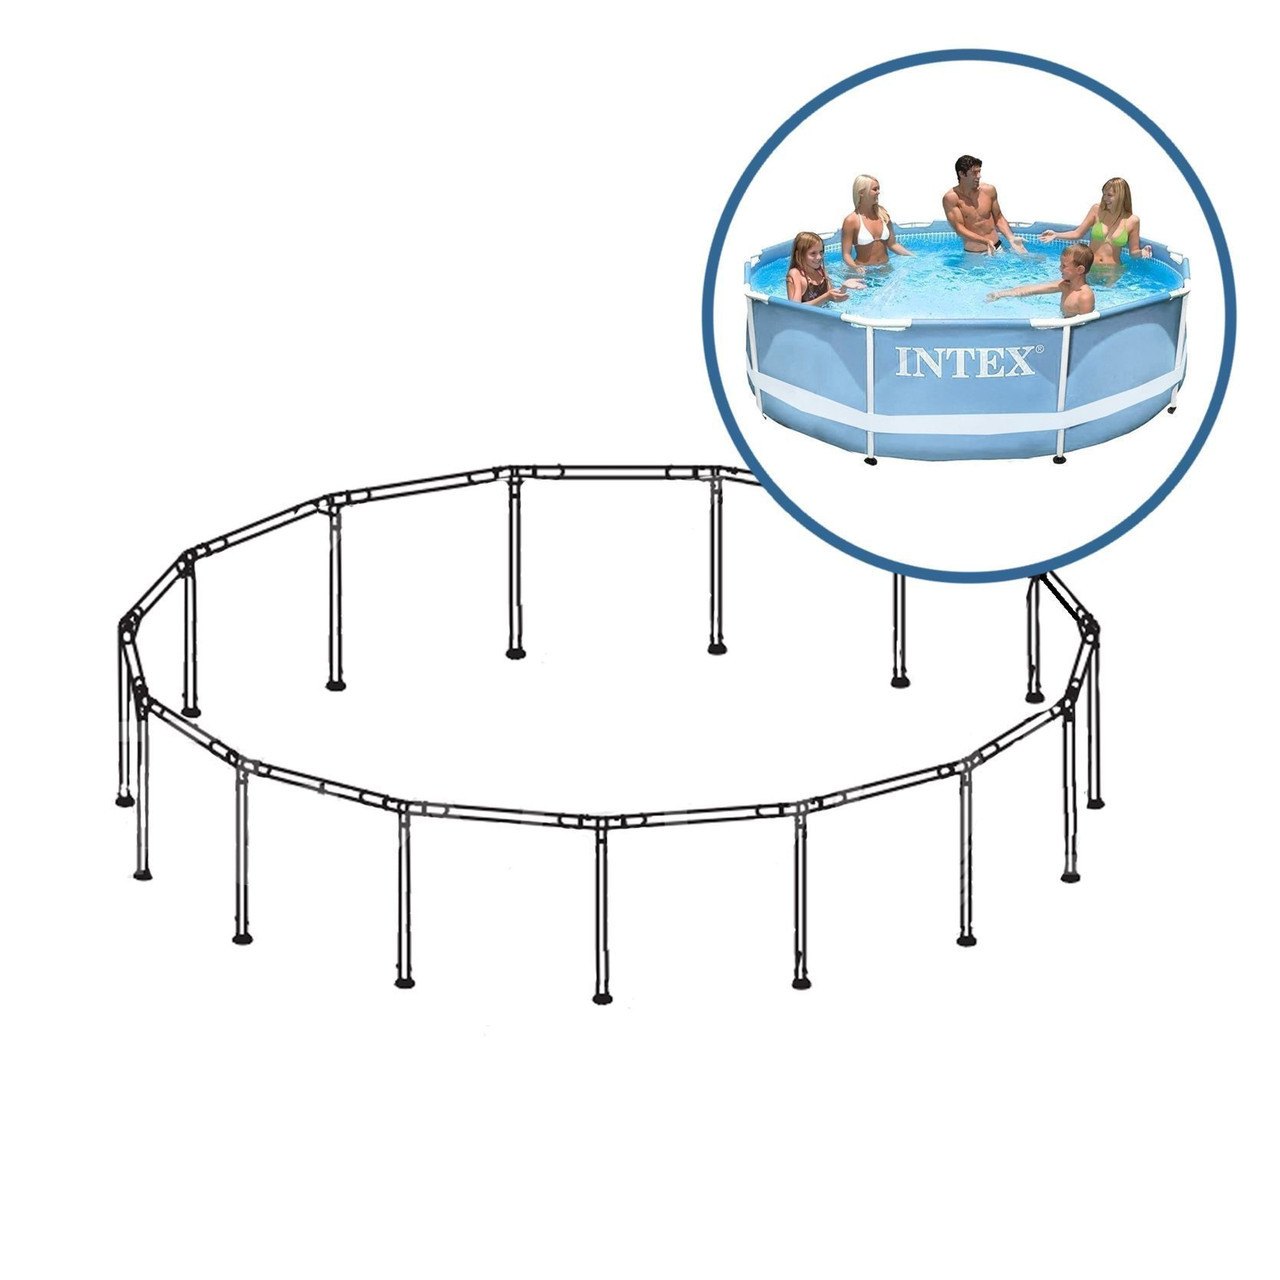 Каркас Intex 88700 для бассейнов Prism Frame 28700. Размер 305 х 76 см